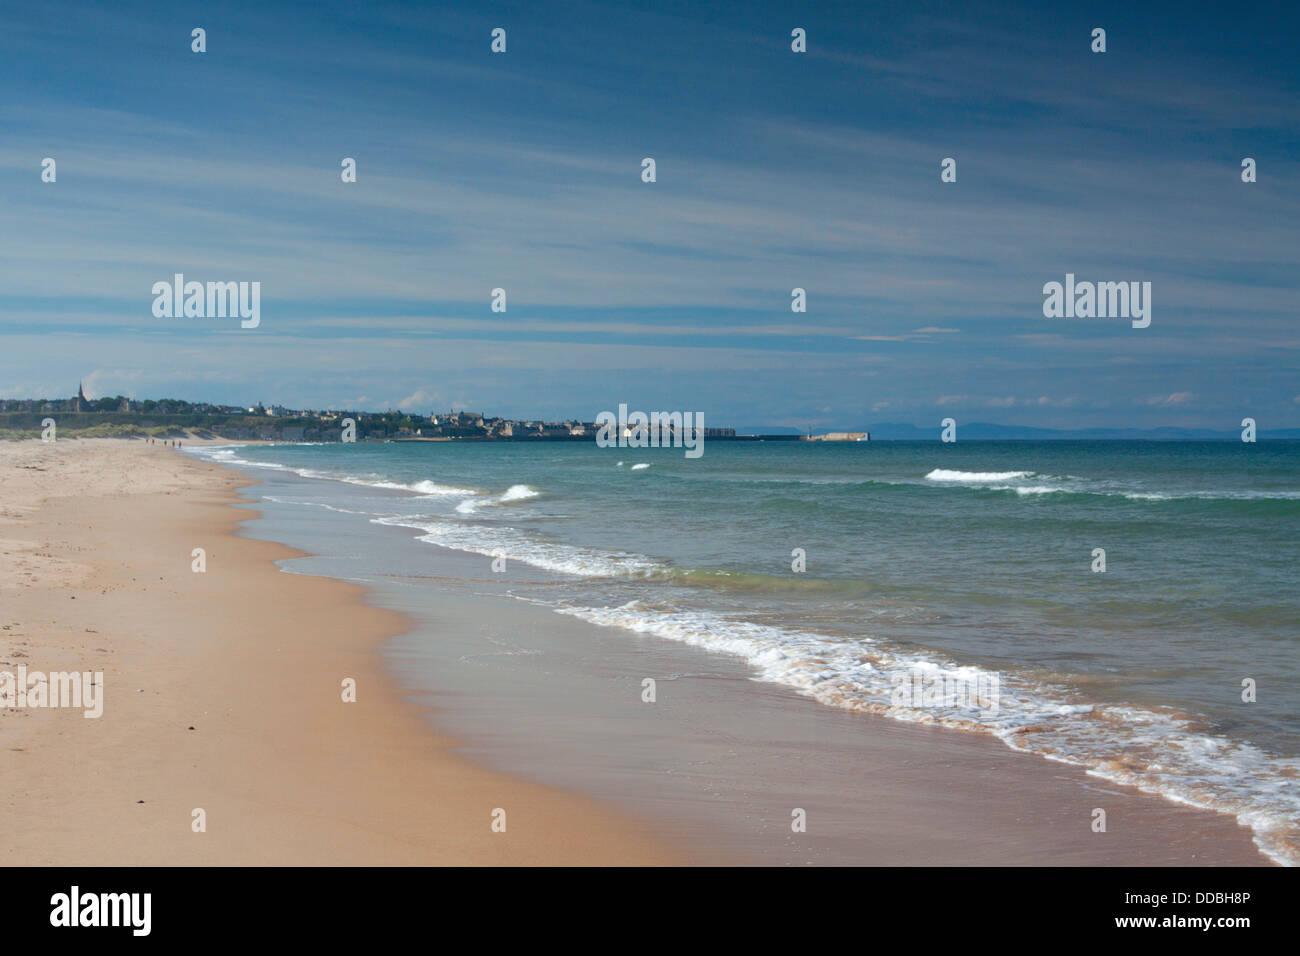 Lossiemouth and Lossiemouth Beach, Lossiemouth, Moray - Stock Image